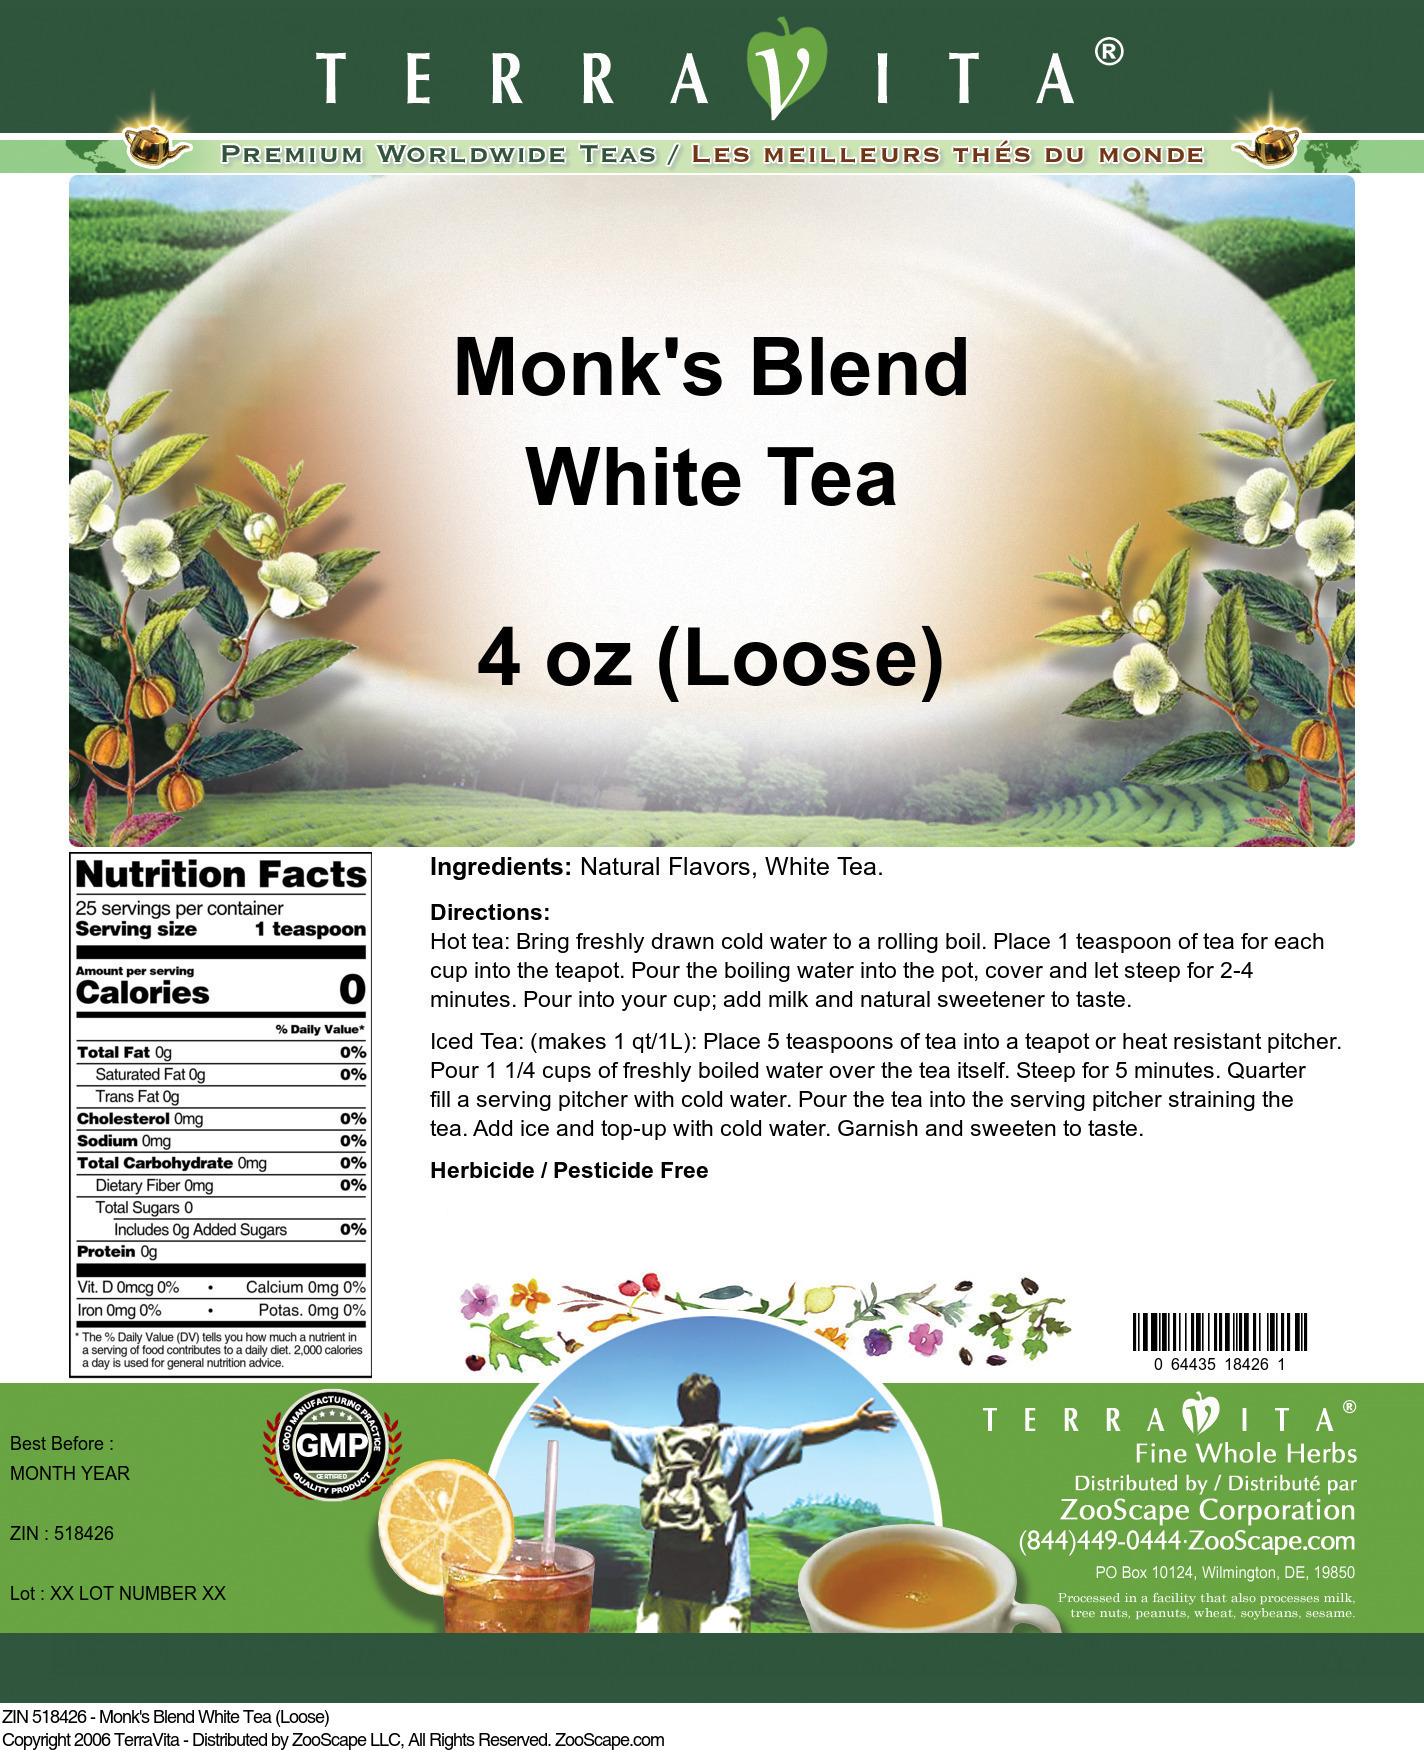 Monk's Blend White Tea (Loose)